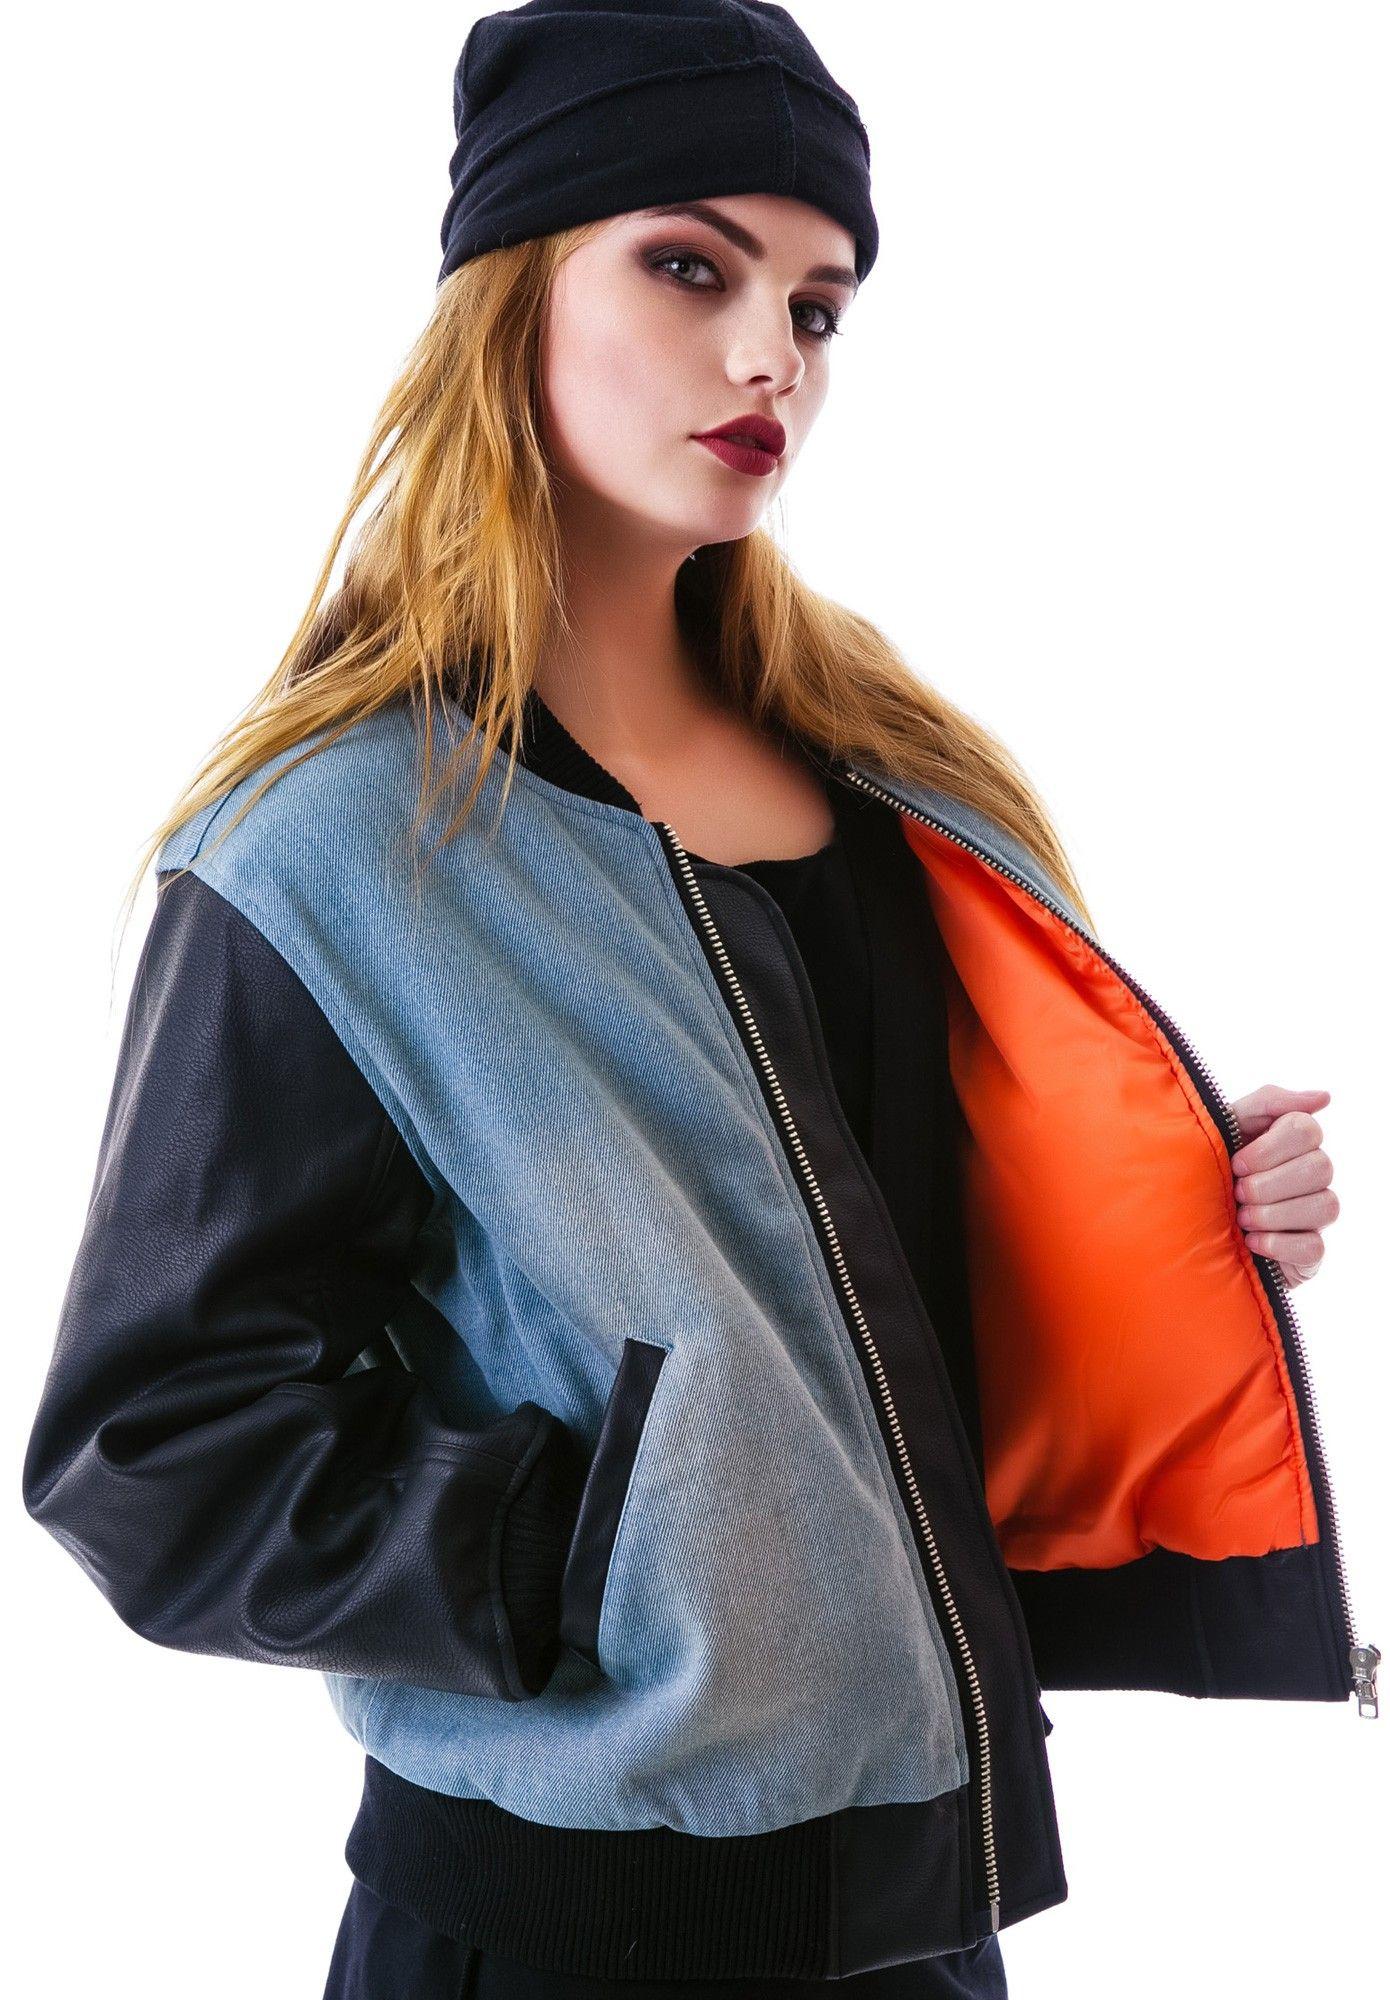 Lark Bomber Bomber jacket, Oversized jacket, Bomber